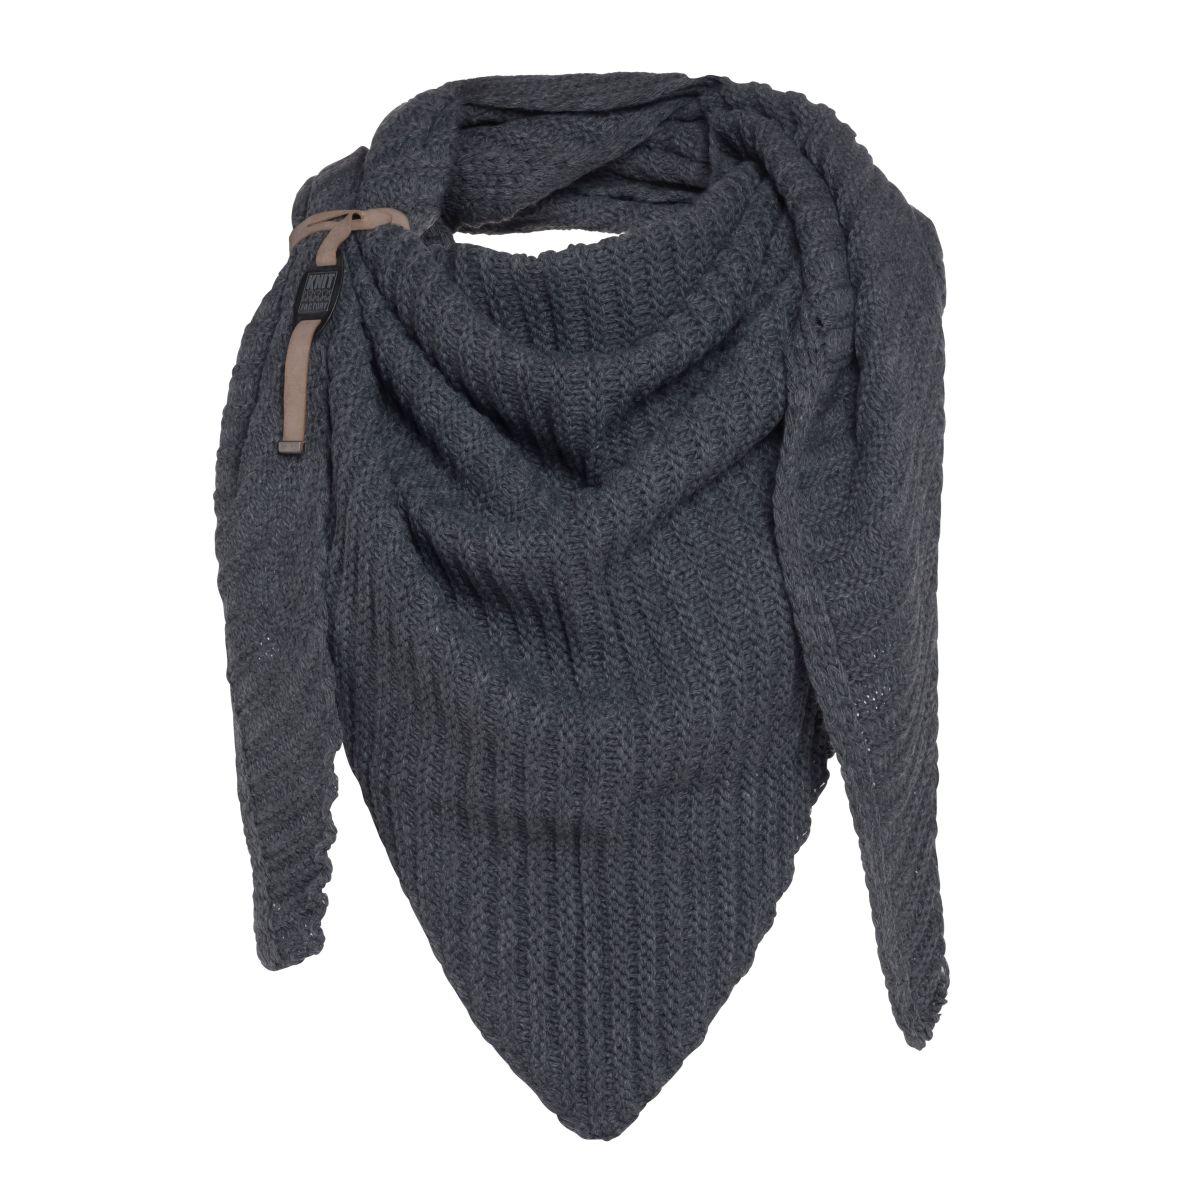 knit factory kf14706001050 demy omslagdoek antraciet 1